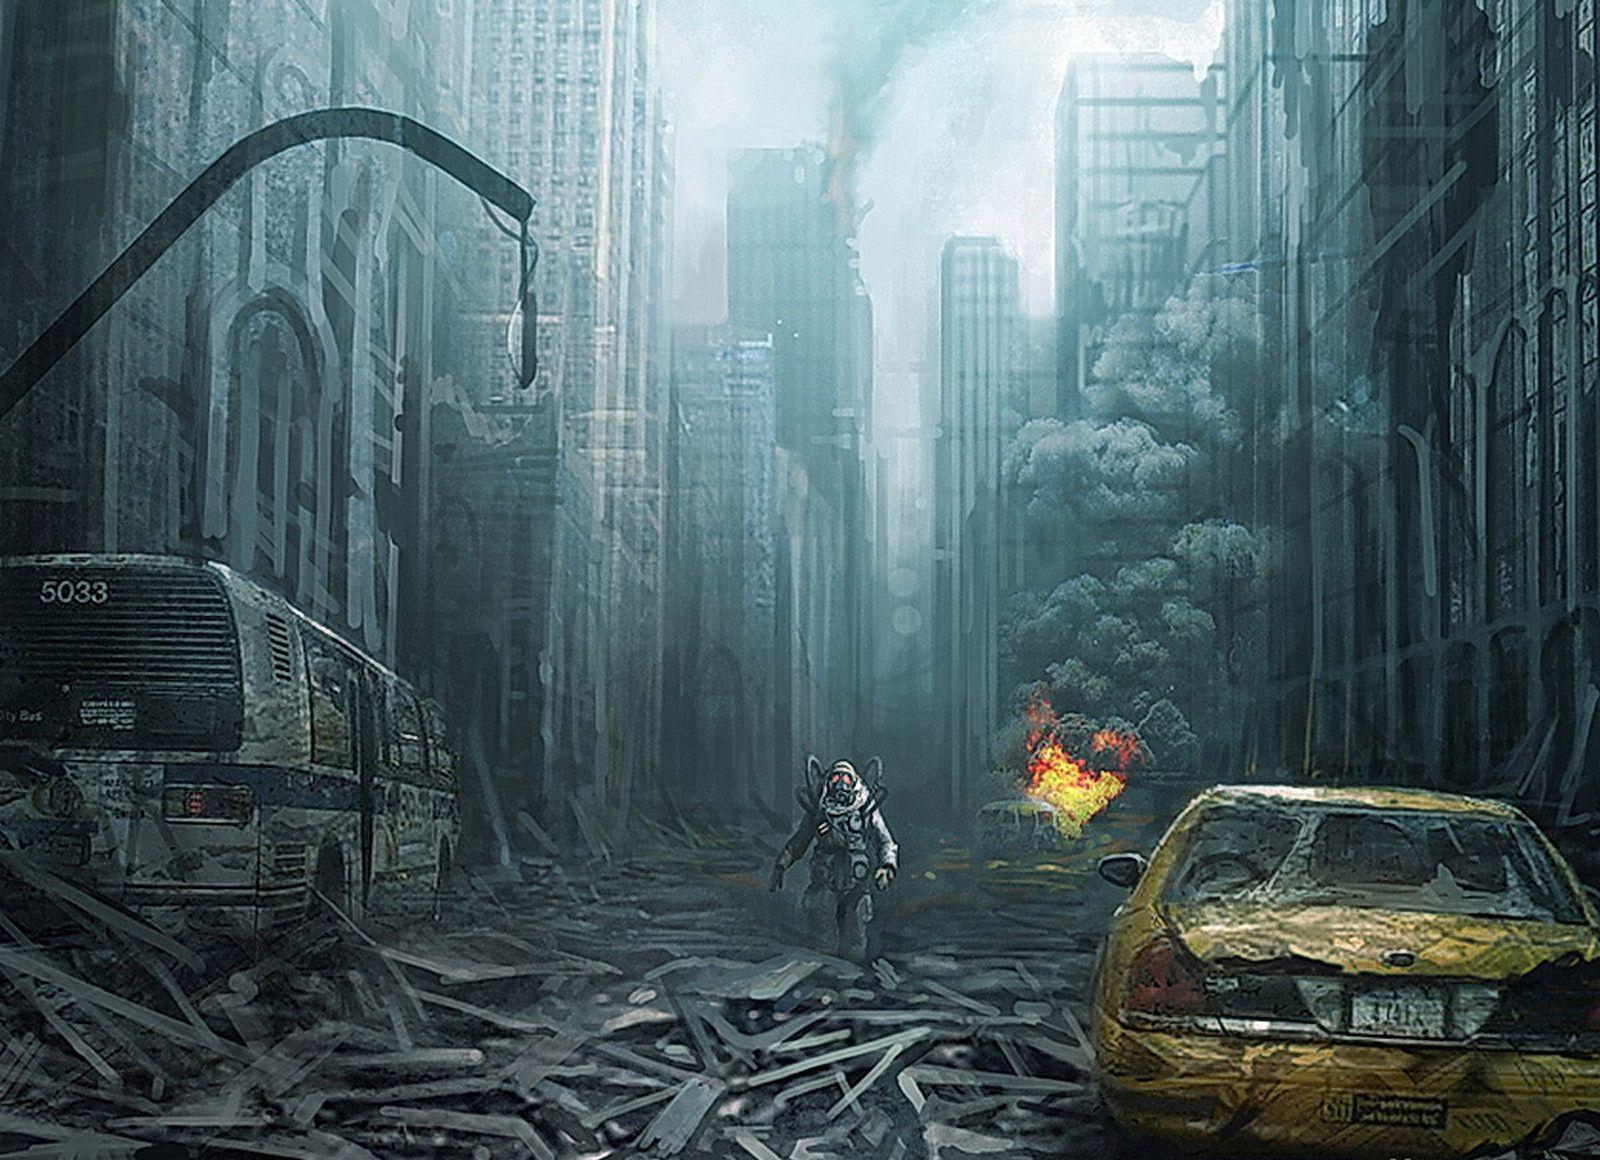 fire apocalypse background - photo #12